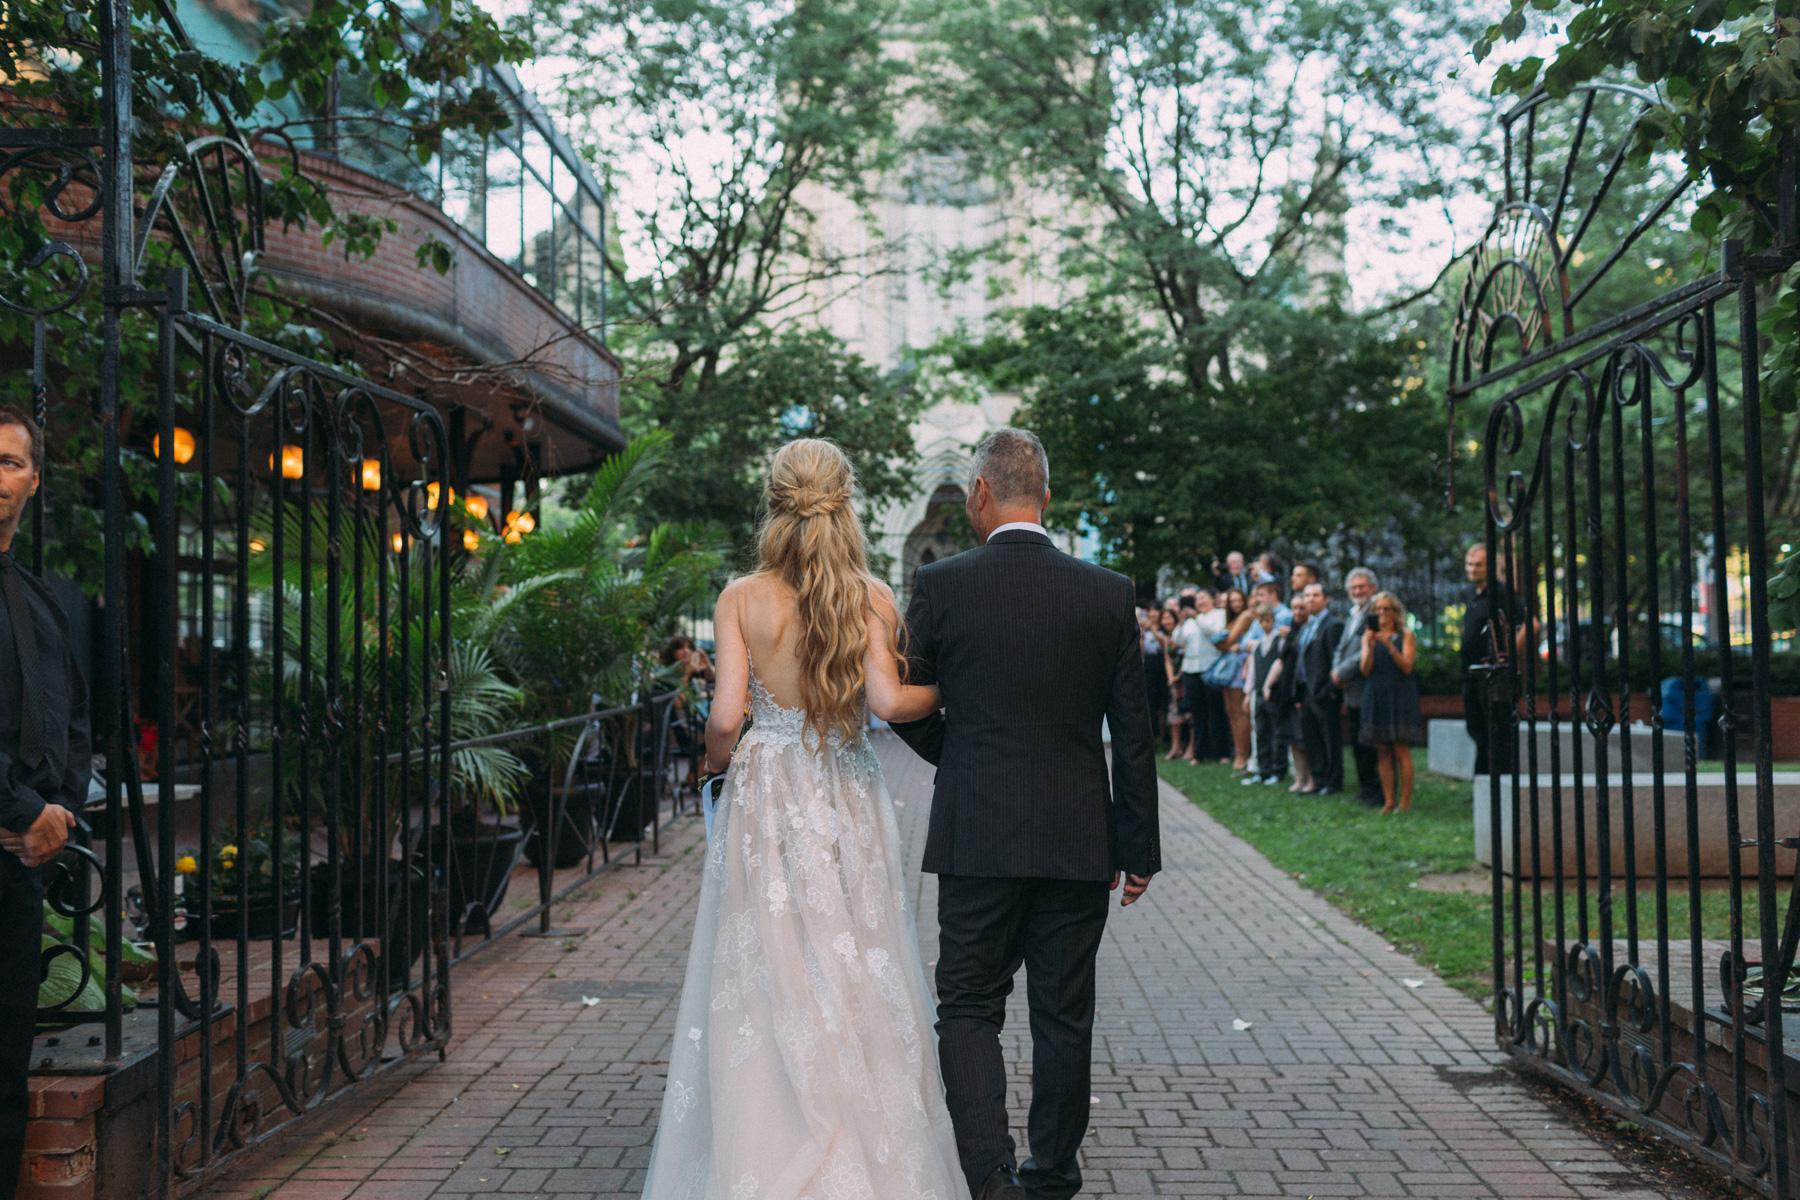 La-Maquette-wedding-by-Toronto-modern-wedding-photographer-Sam-Wong_26.jpg